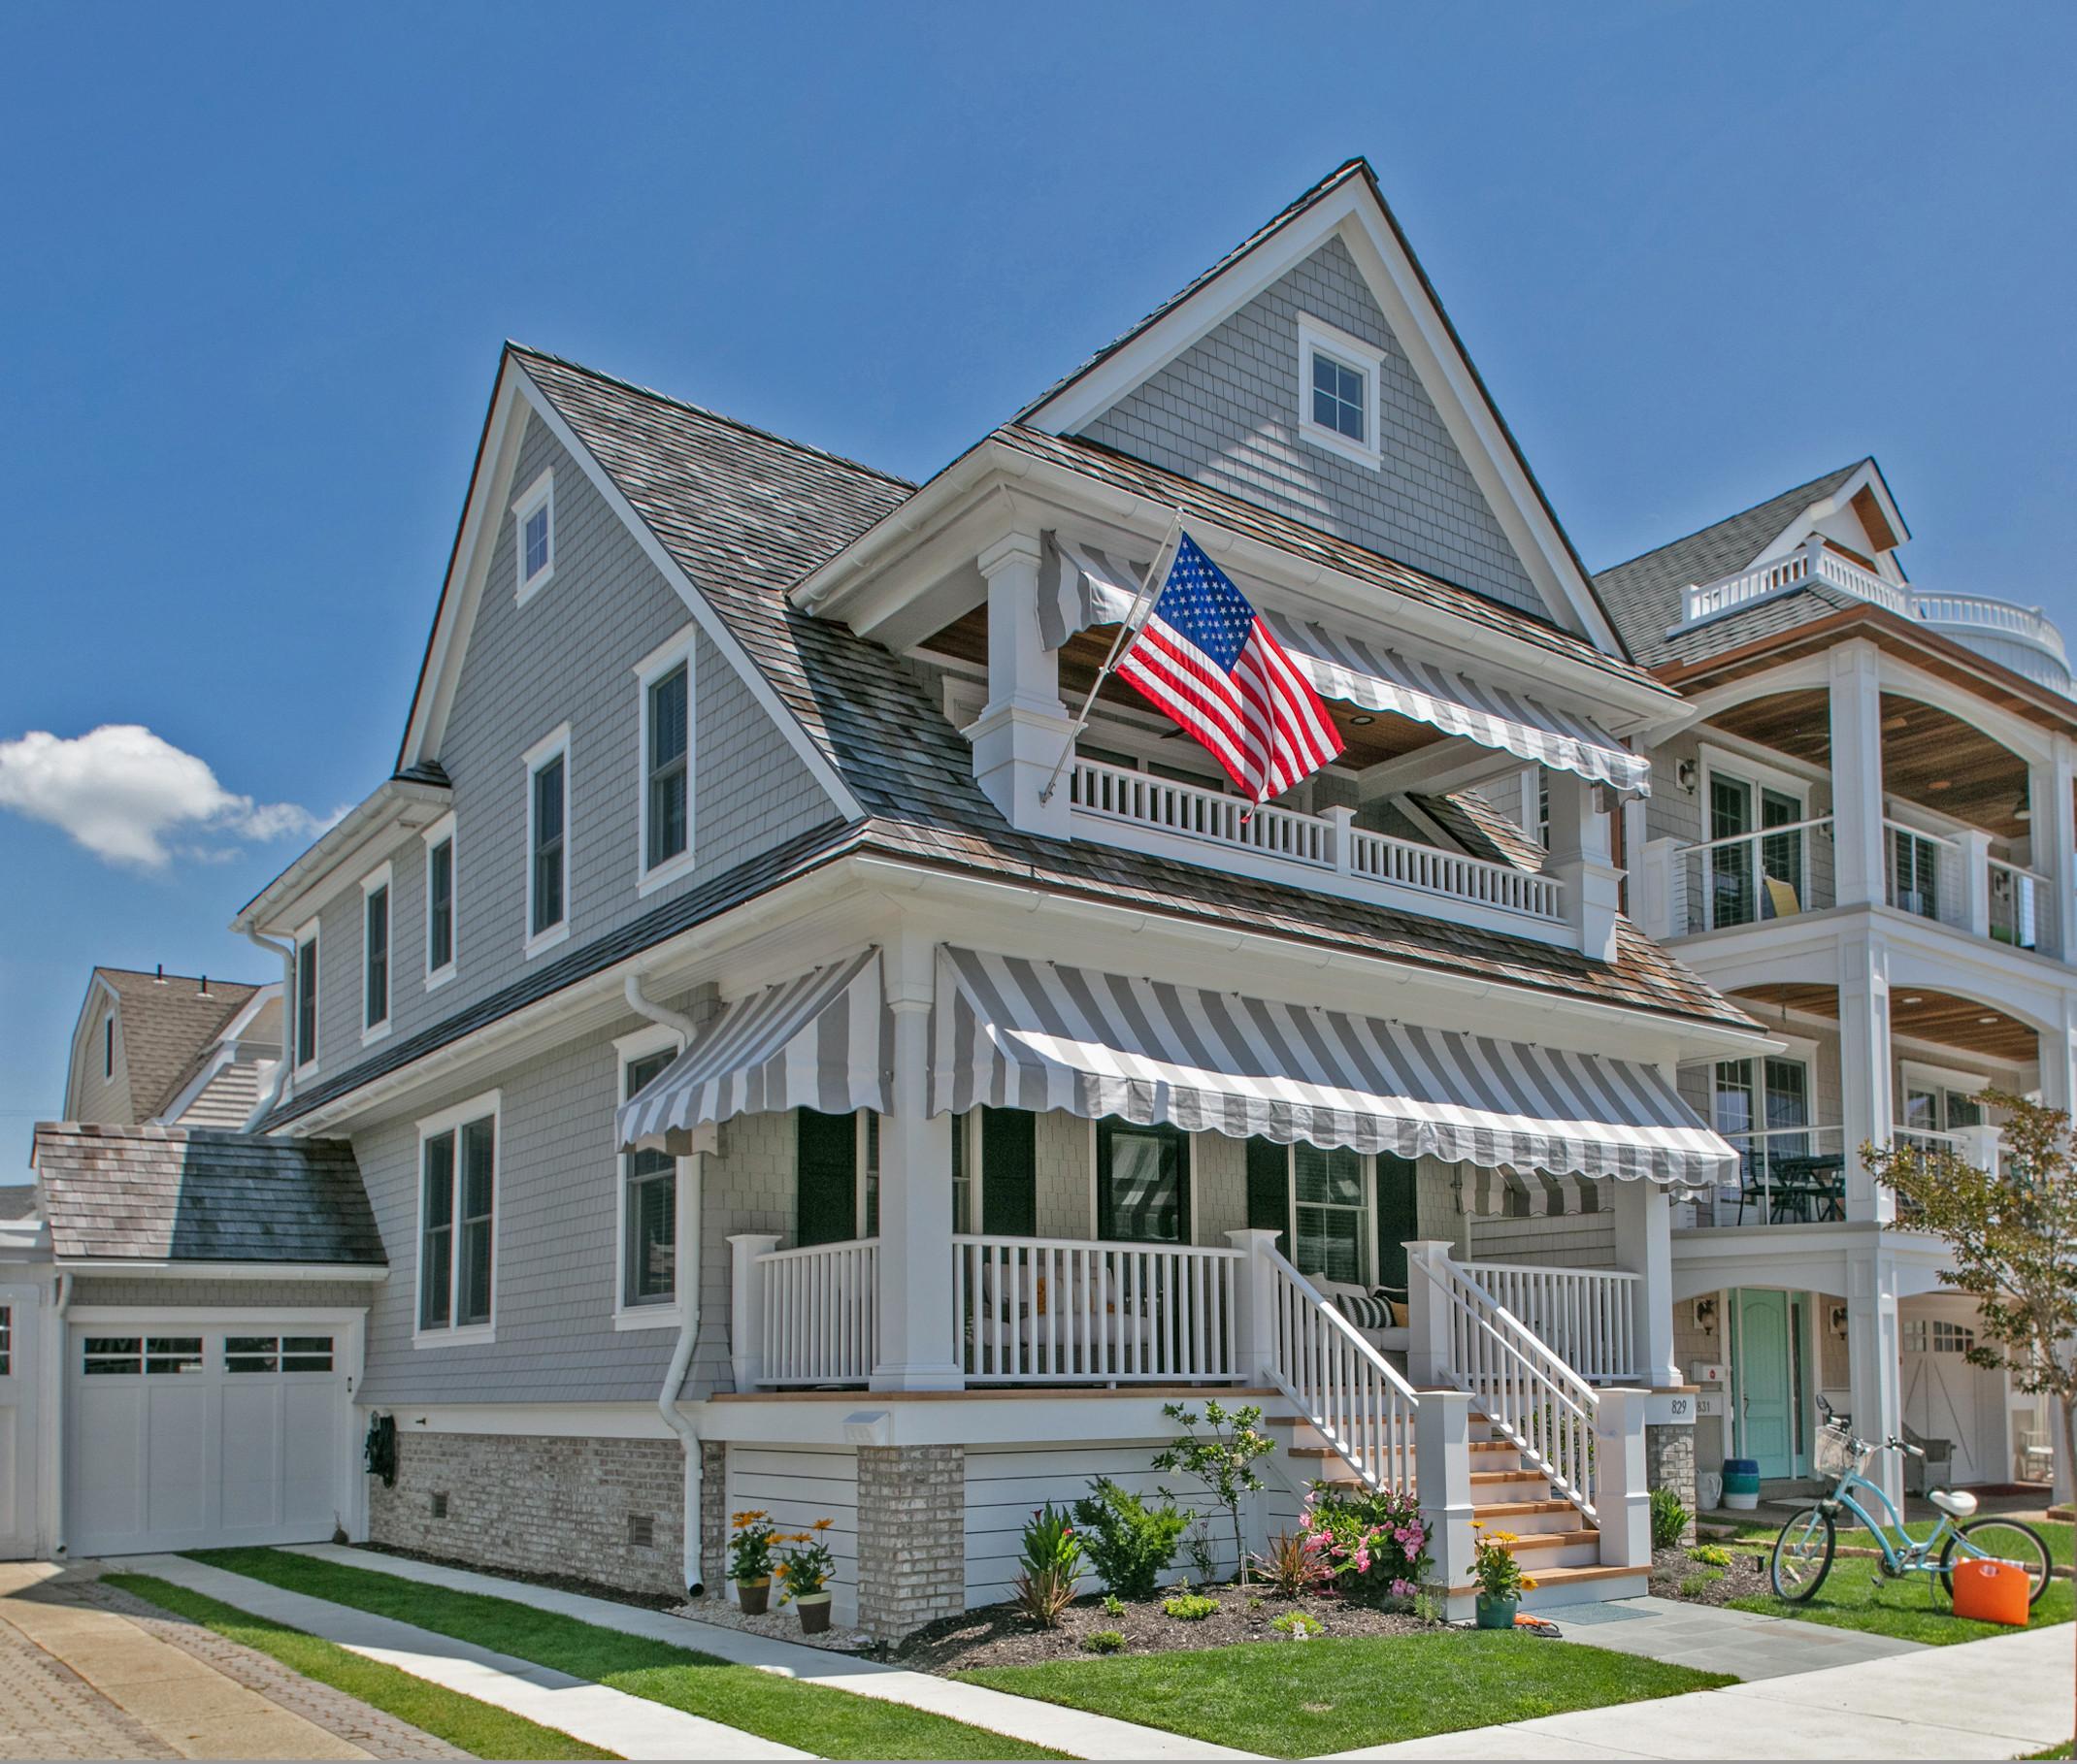 Ocean City Beach Home - Complete Renovation